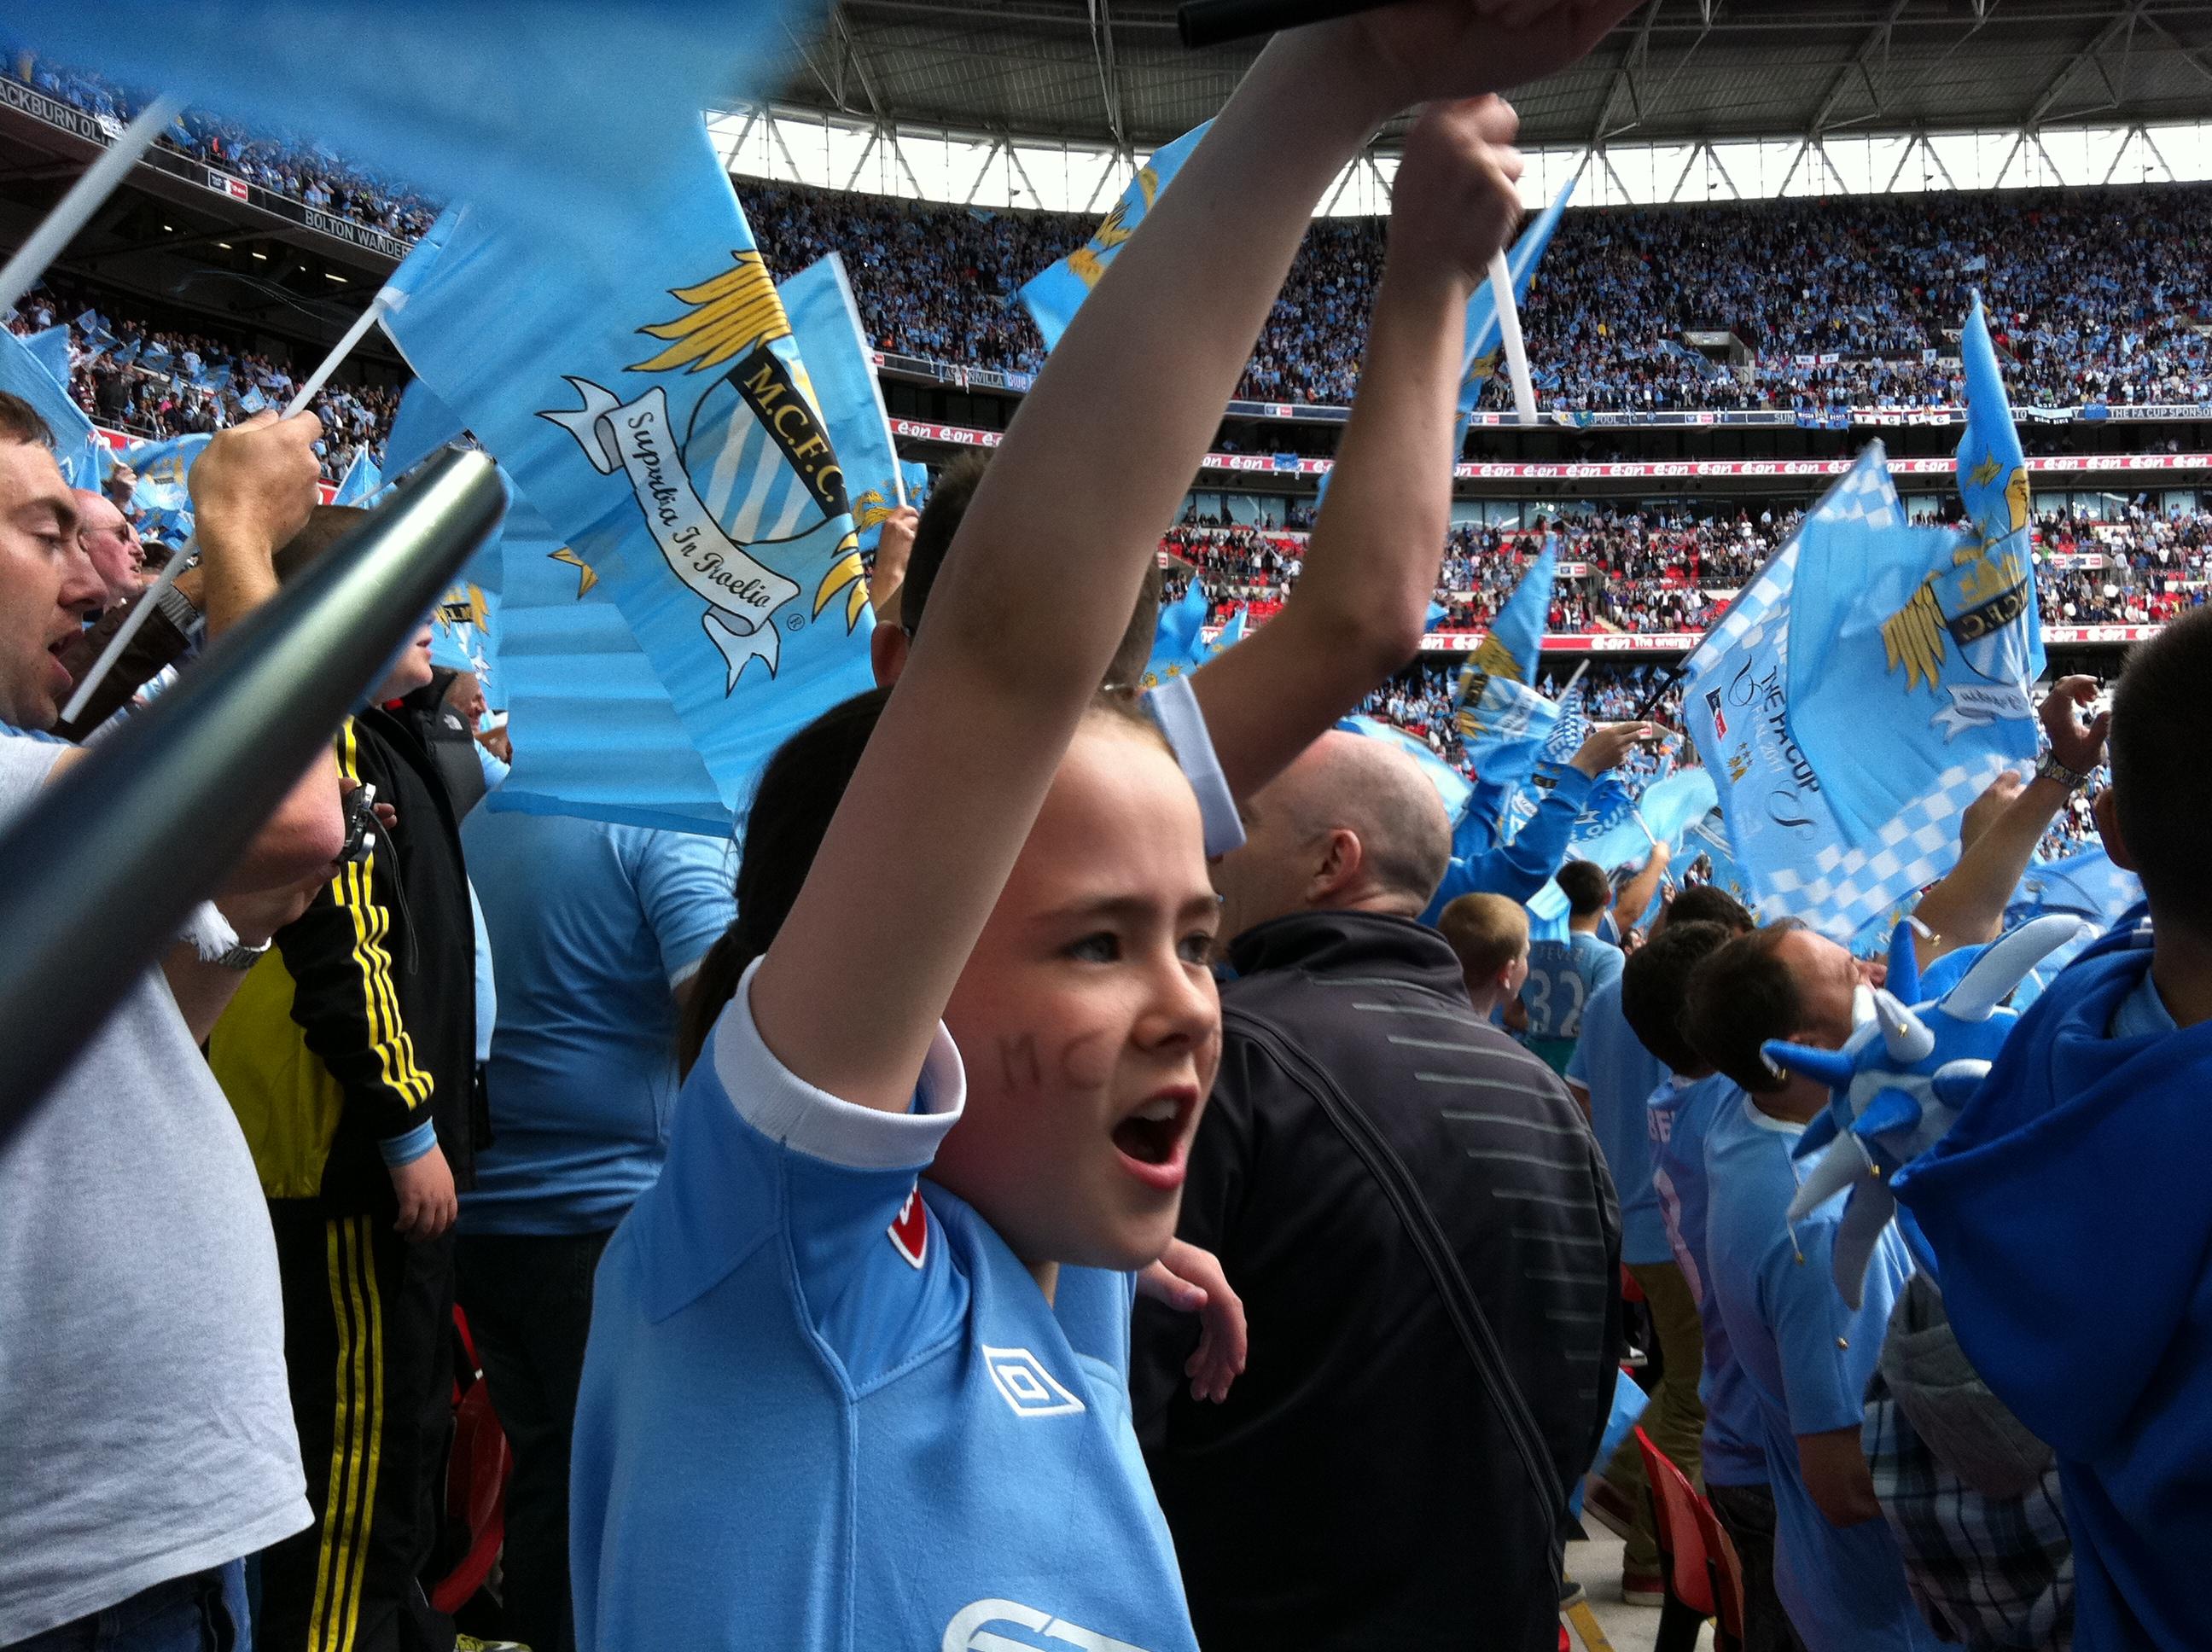 2011-fa-cup-final-6_0.jpg